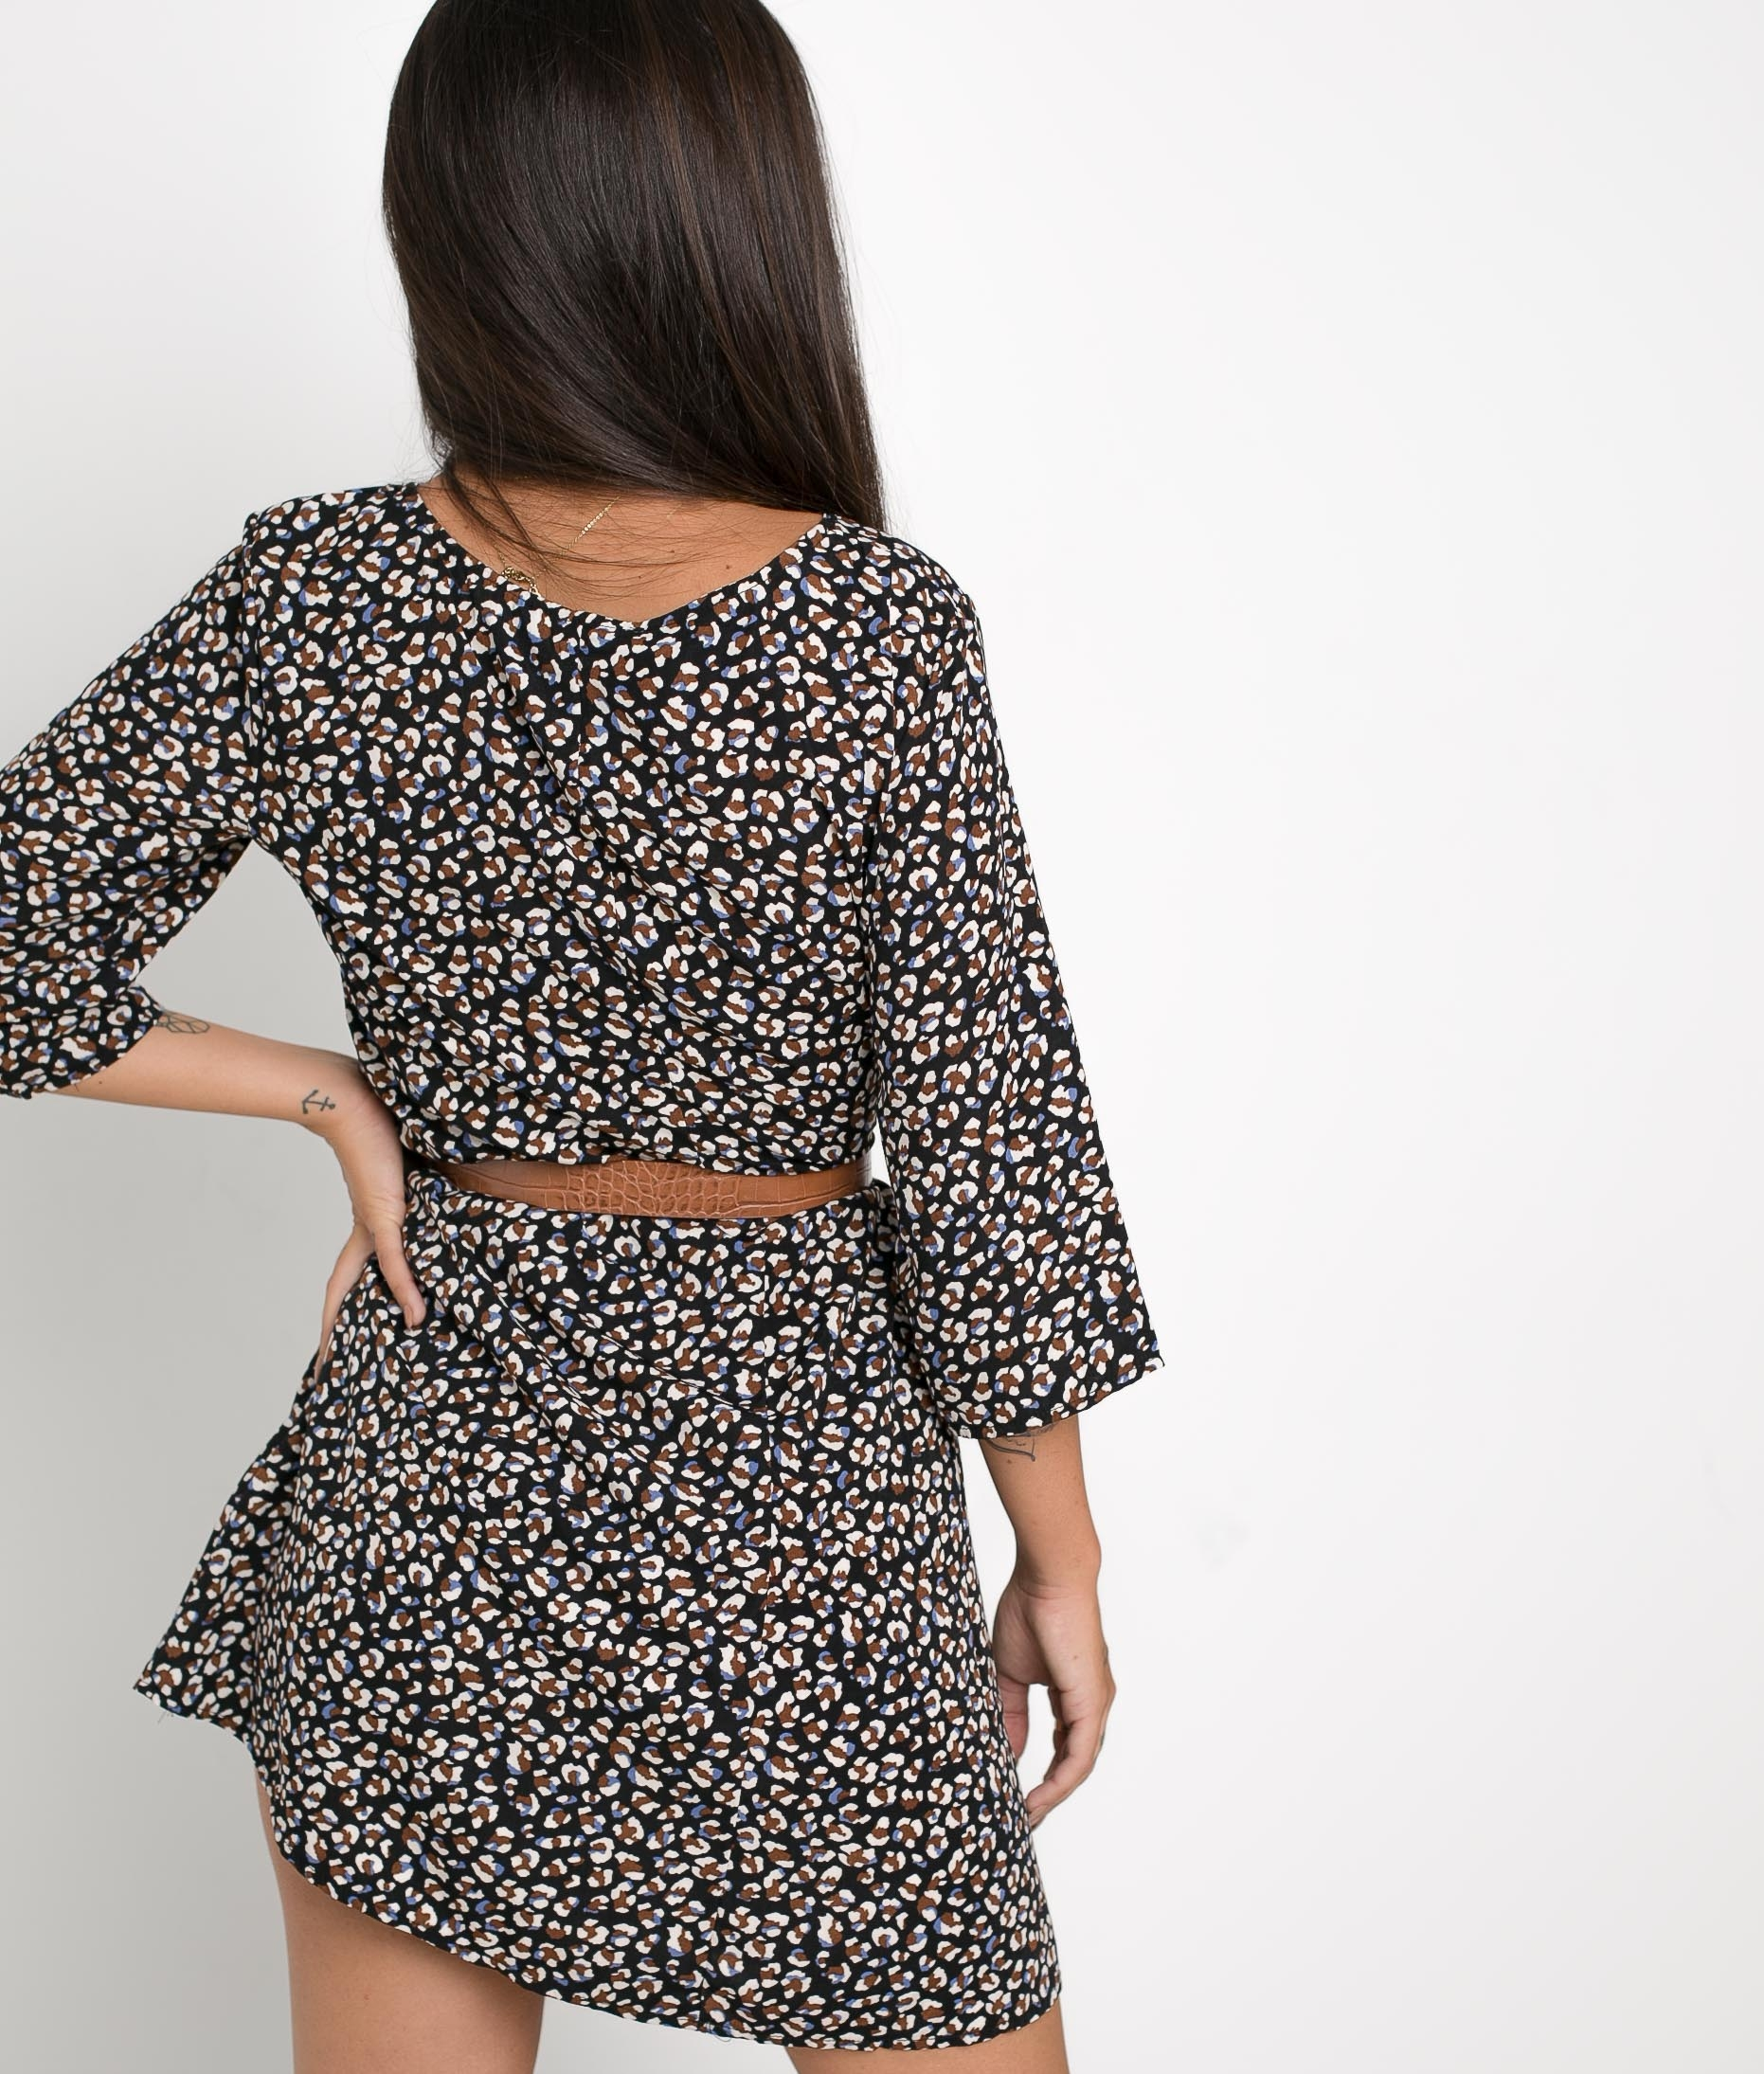 DRESS FELINA - BLACK